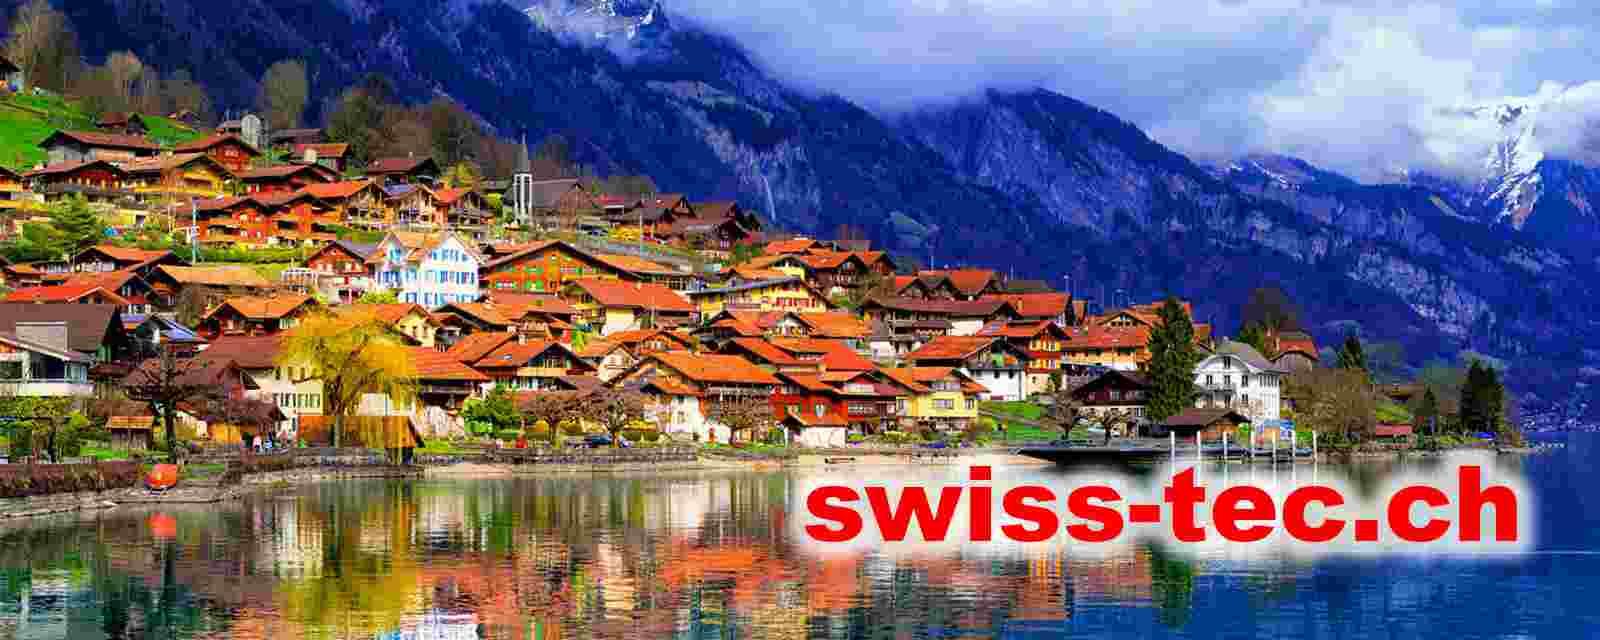 www.swiss-tec.ch (unsere Partnerseite)